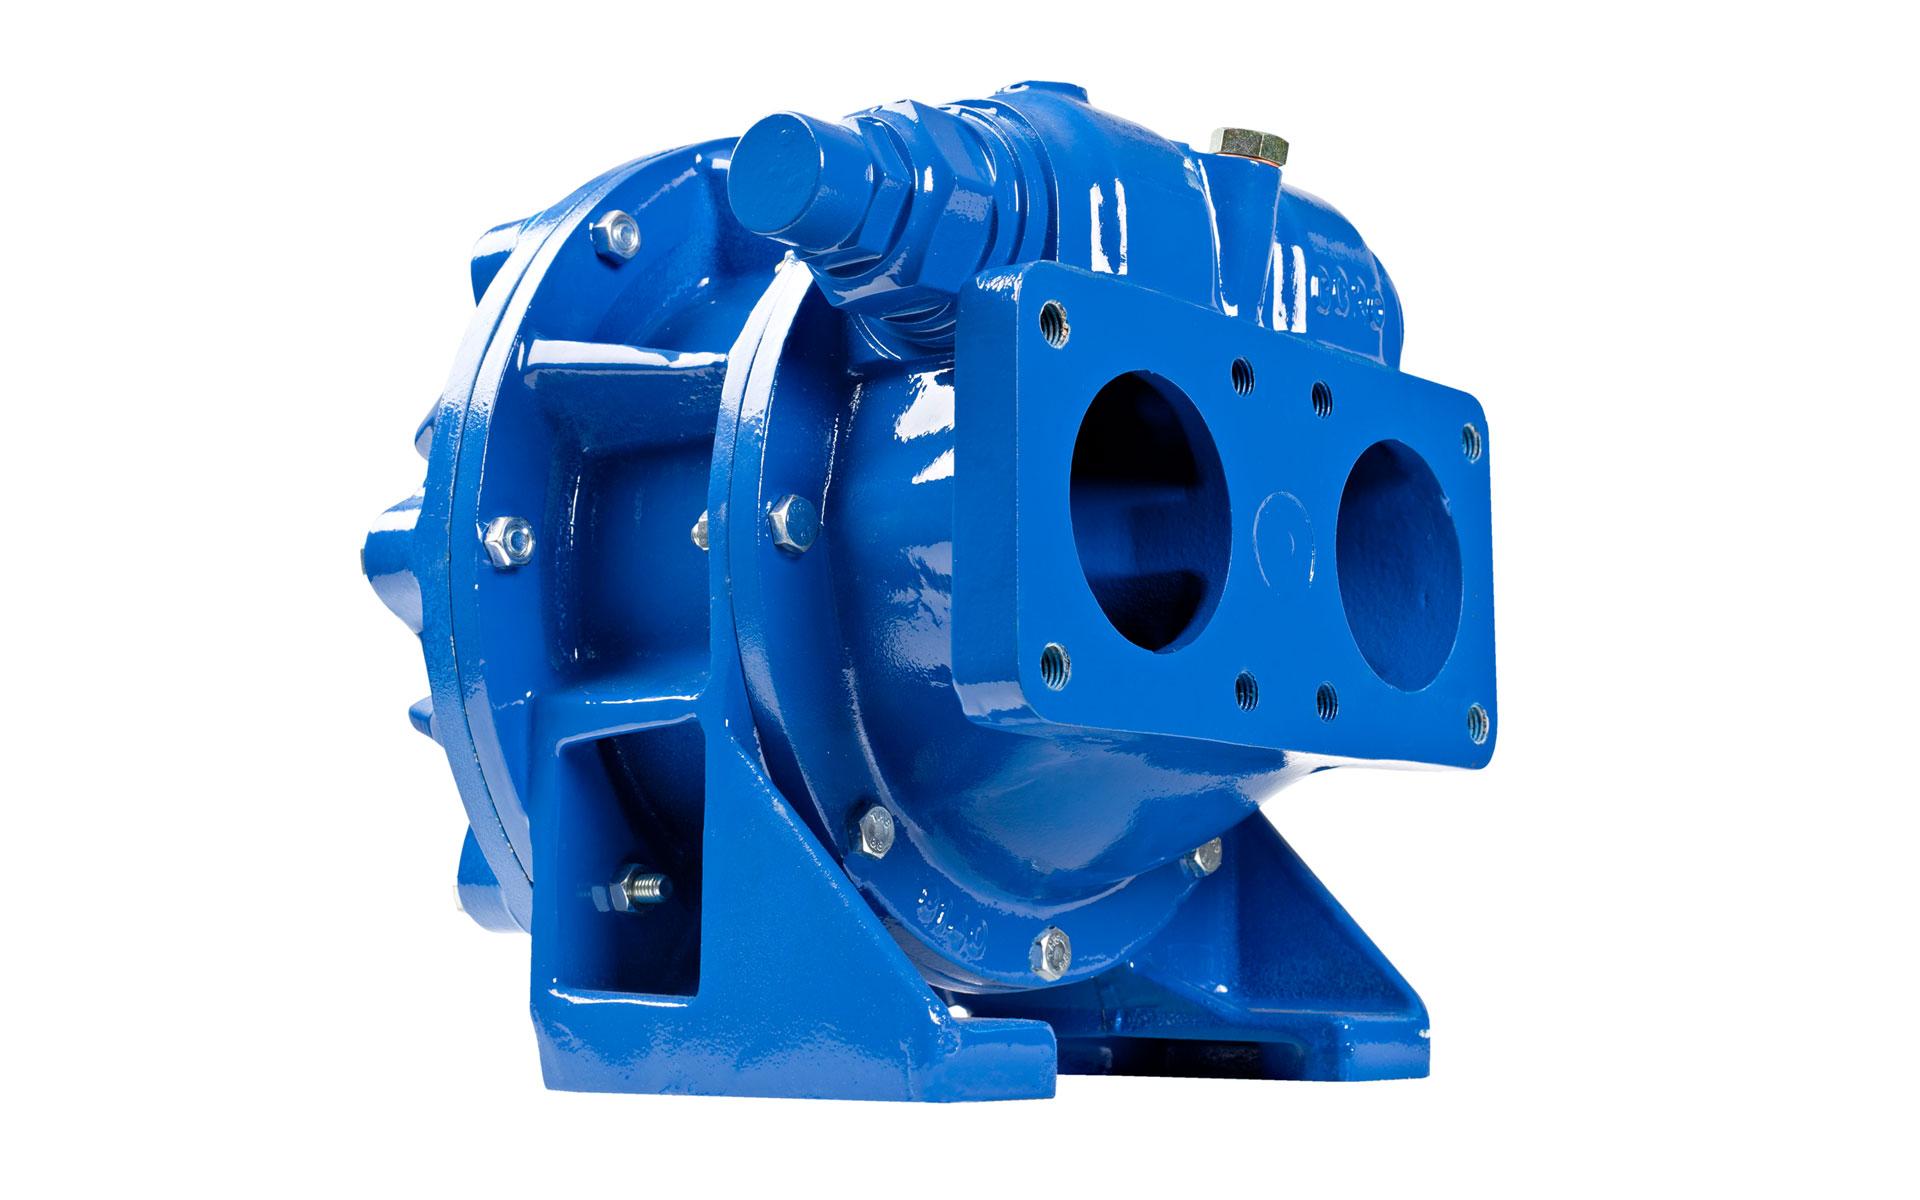 cc8-selbstansaugende-pumpe